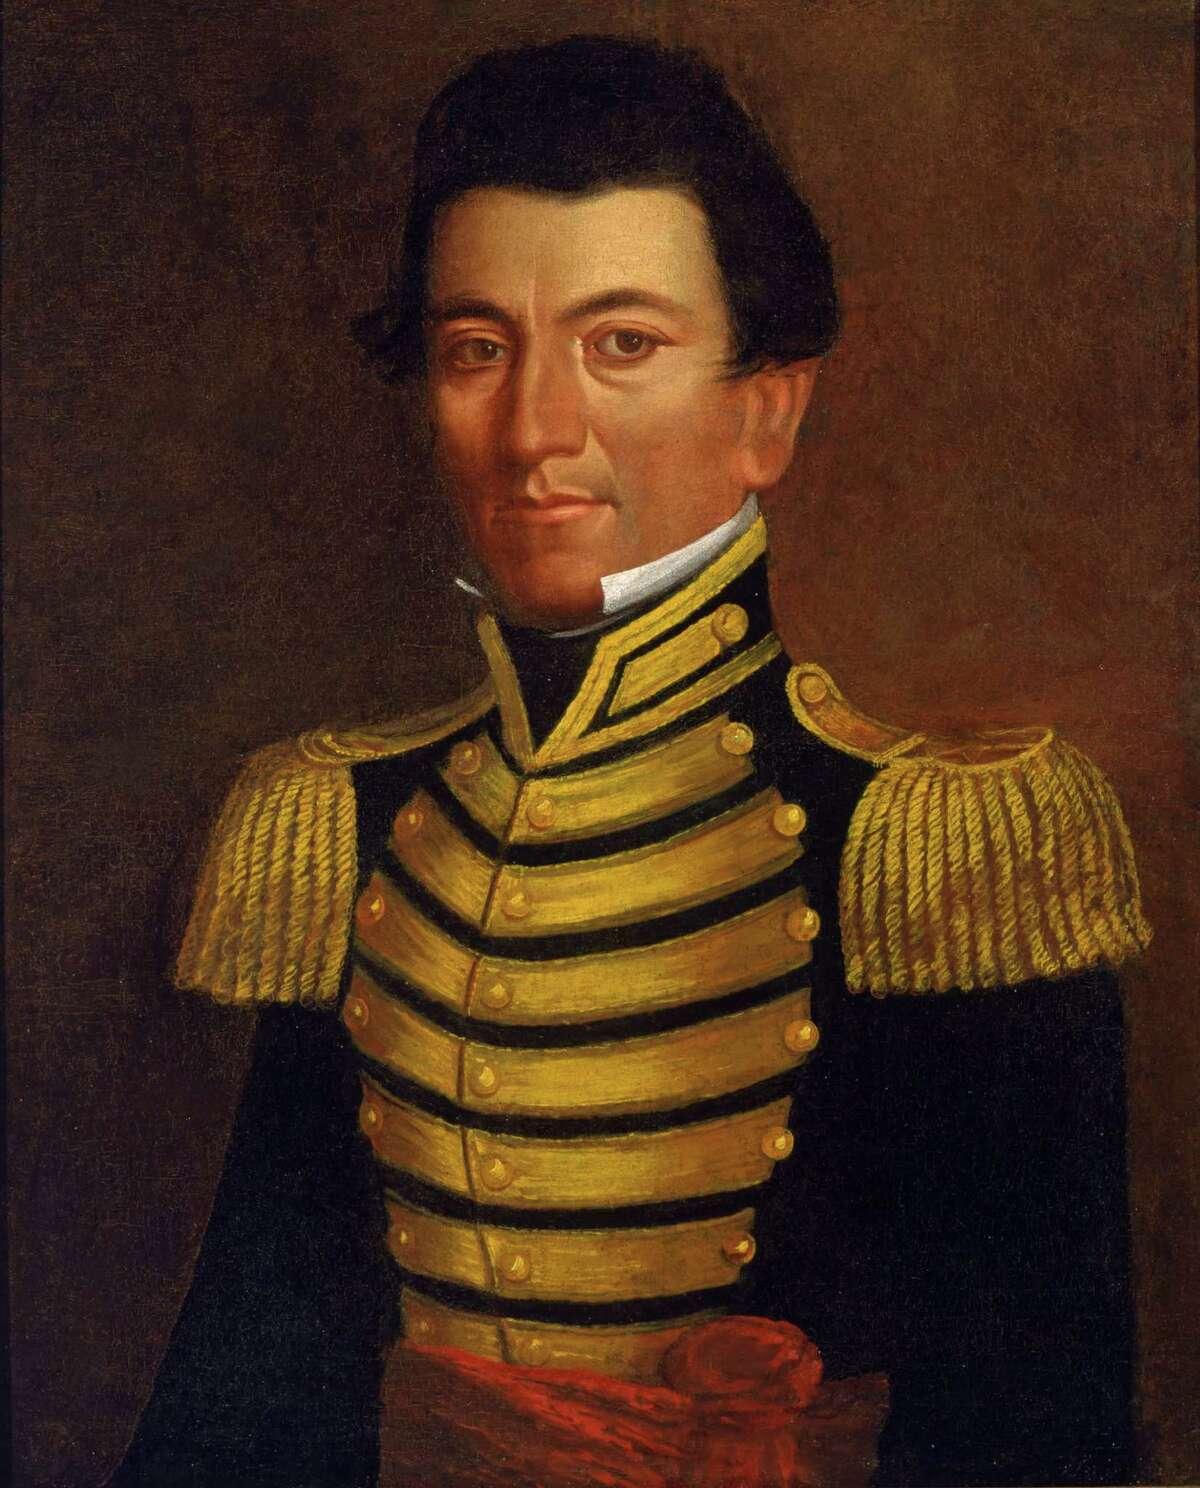 Juan Seguin, a hero of the Texas Revolution, was San Antonio's first Hispanic mayor.